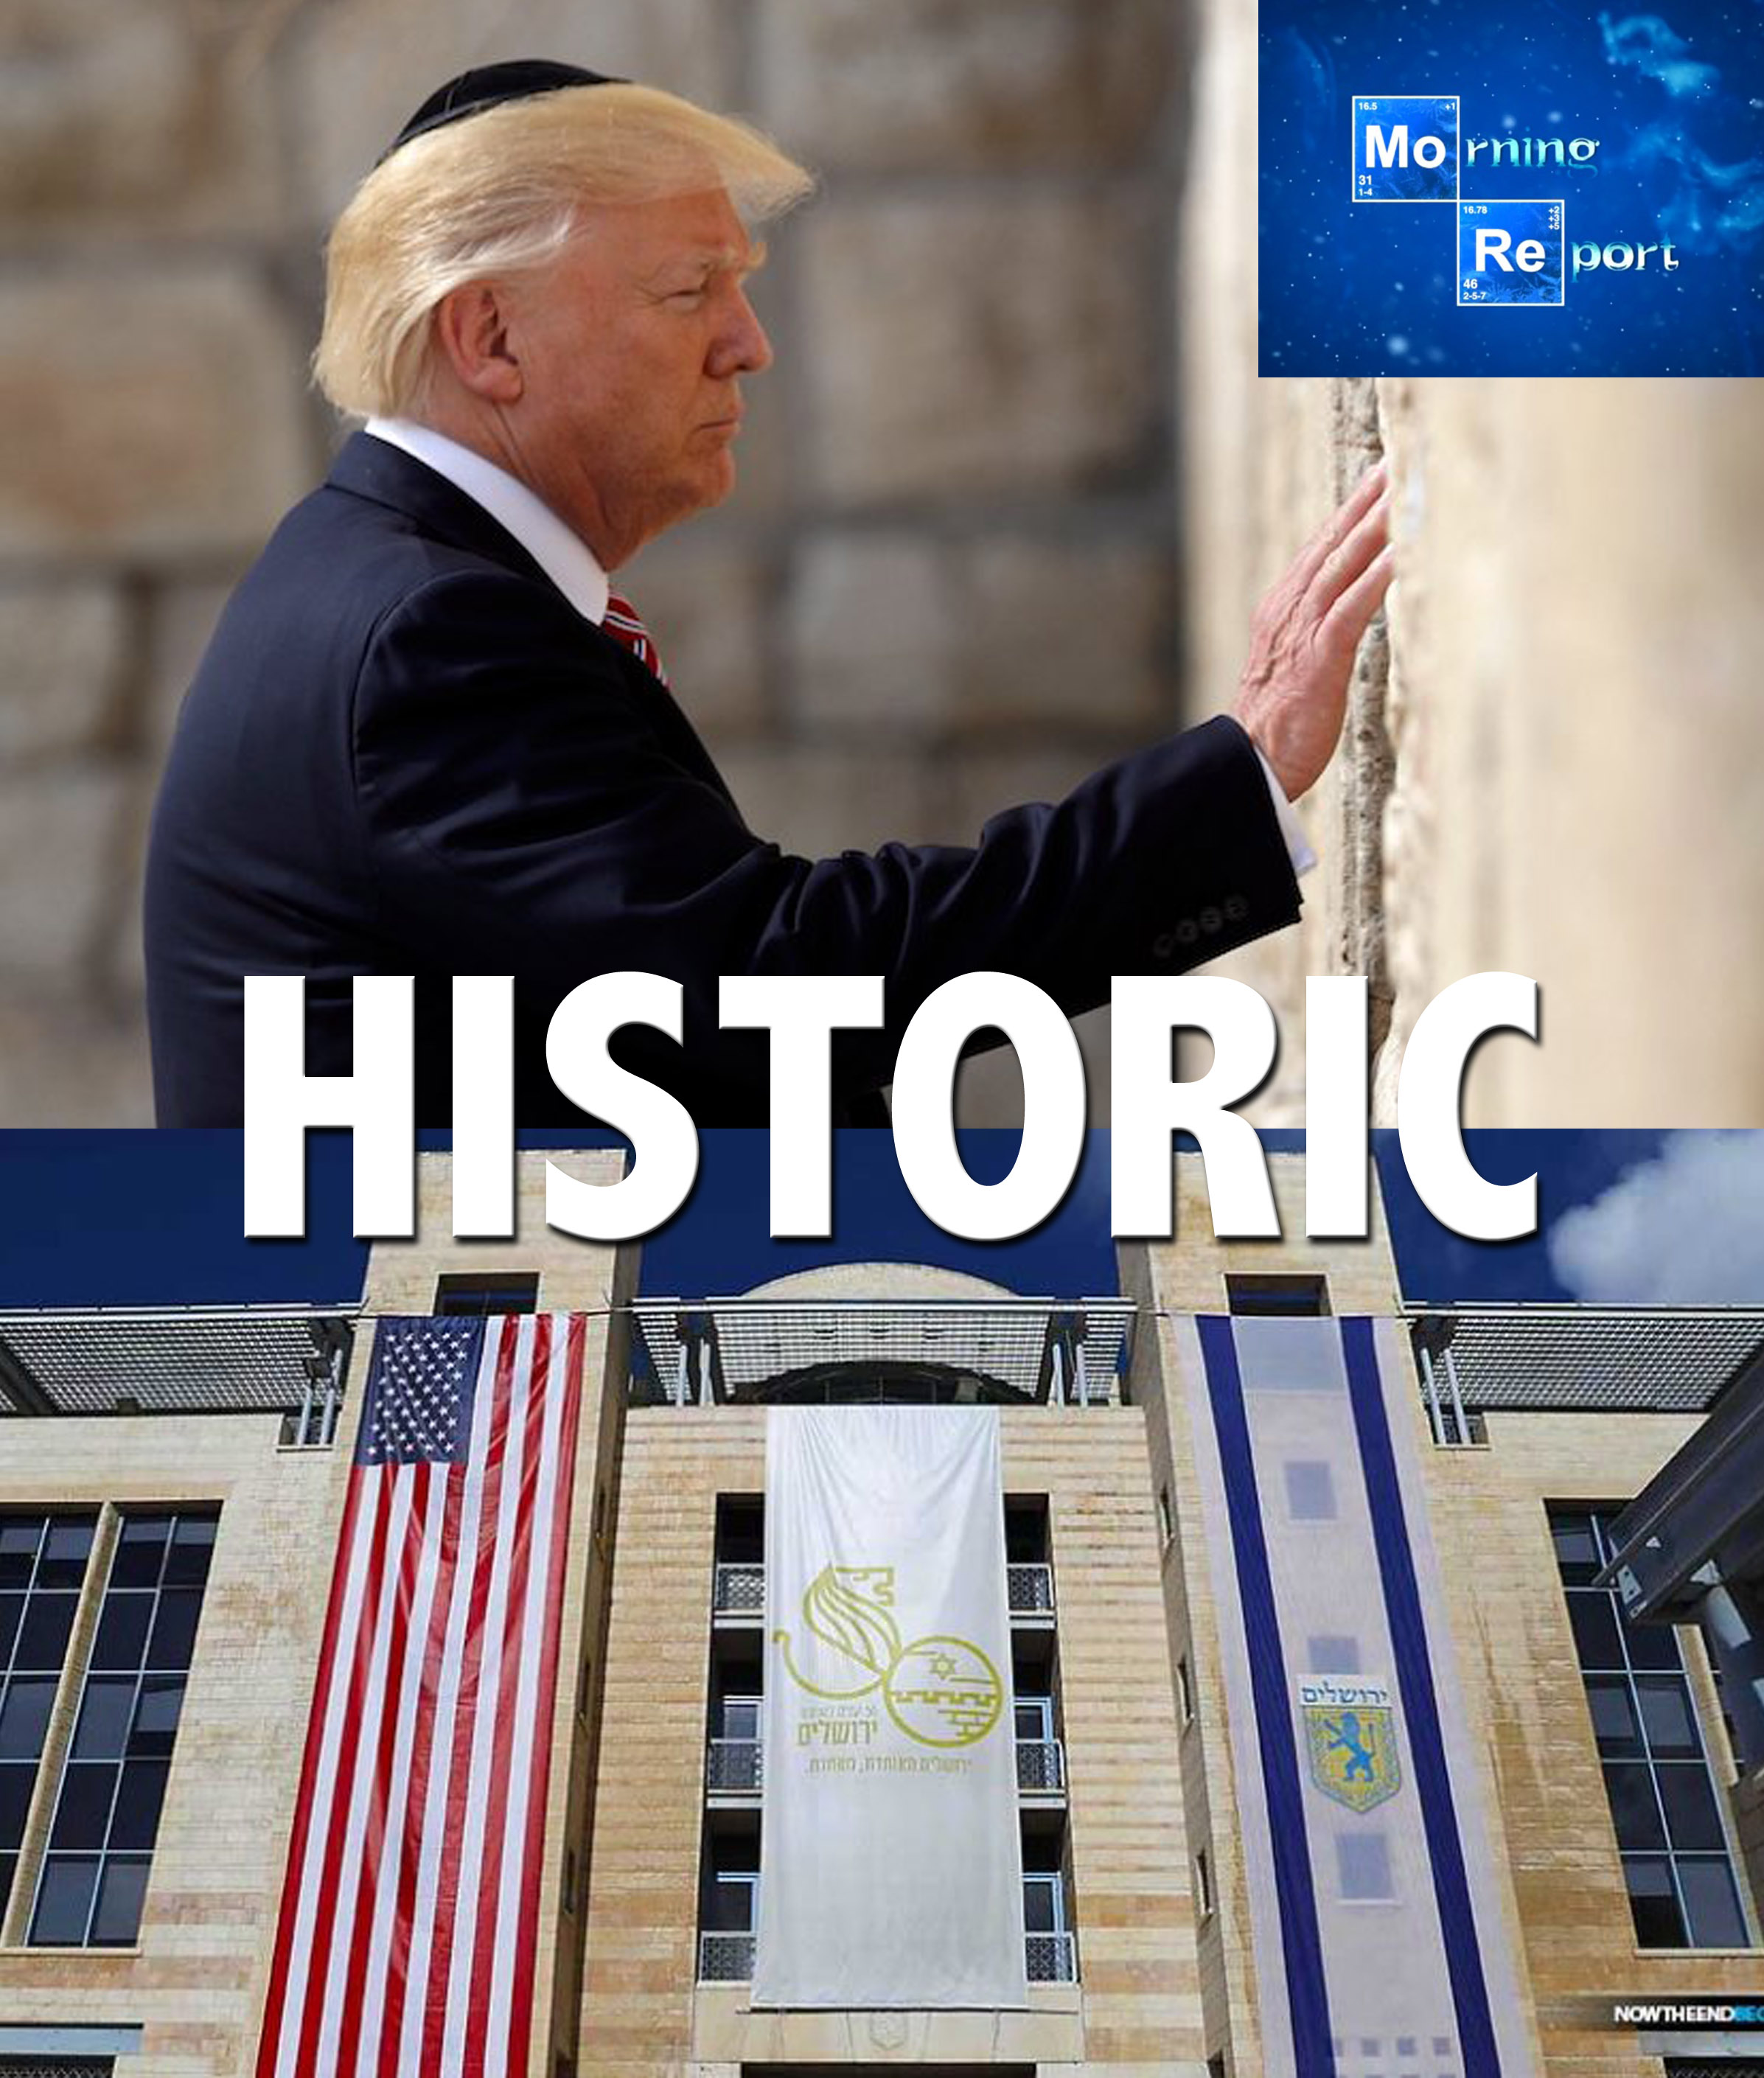 historic.jpg